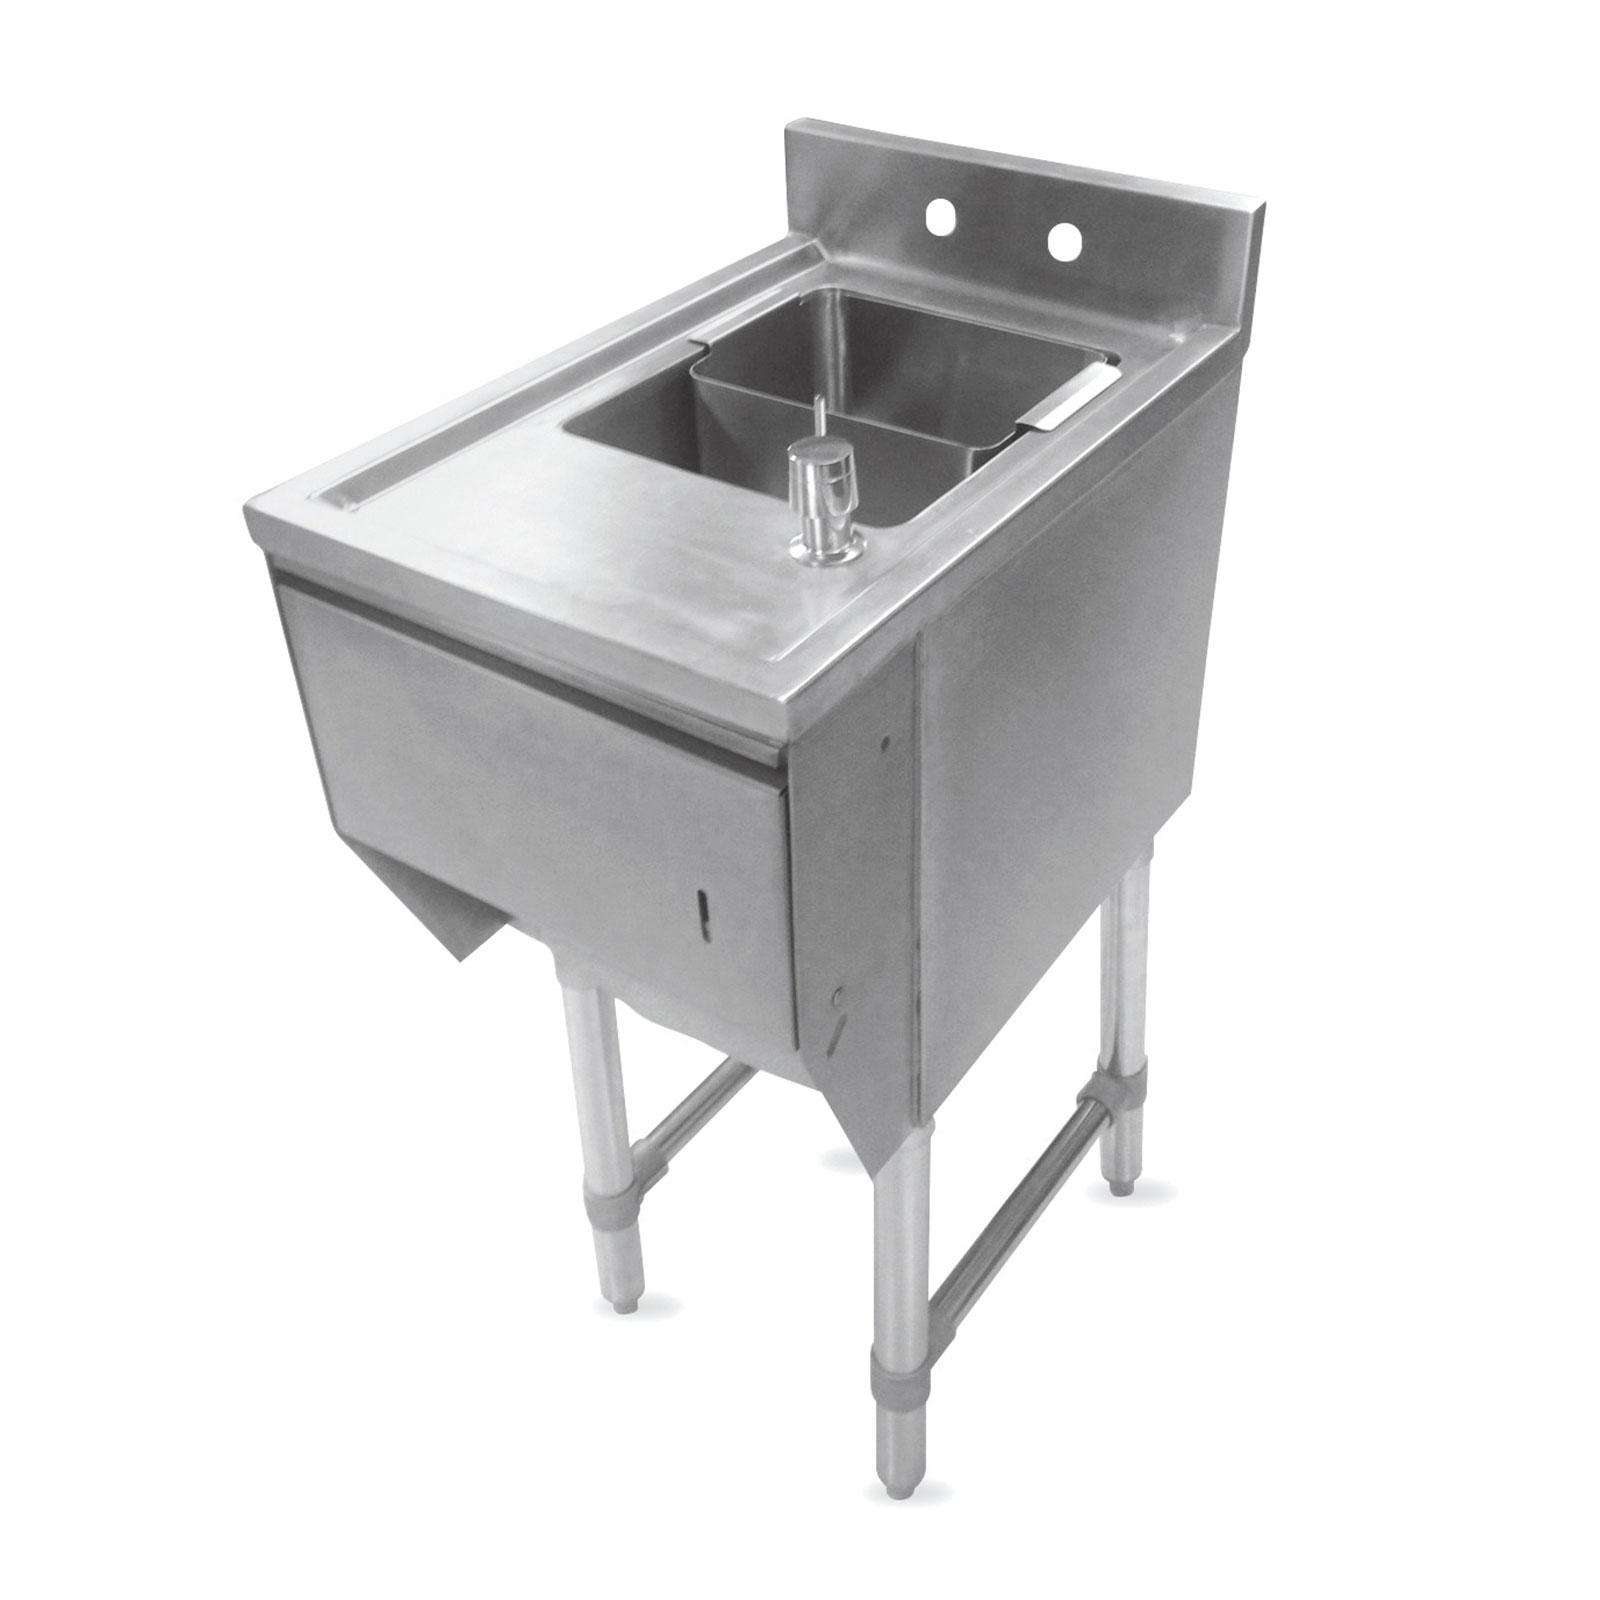 John Boos EUBDS-1518STD underbar sink units